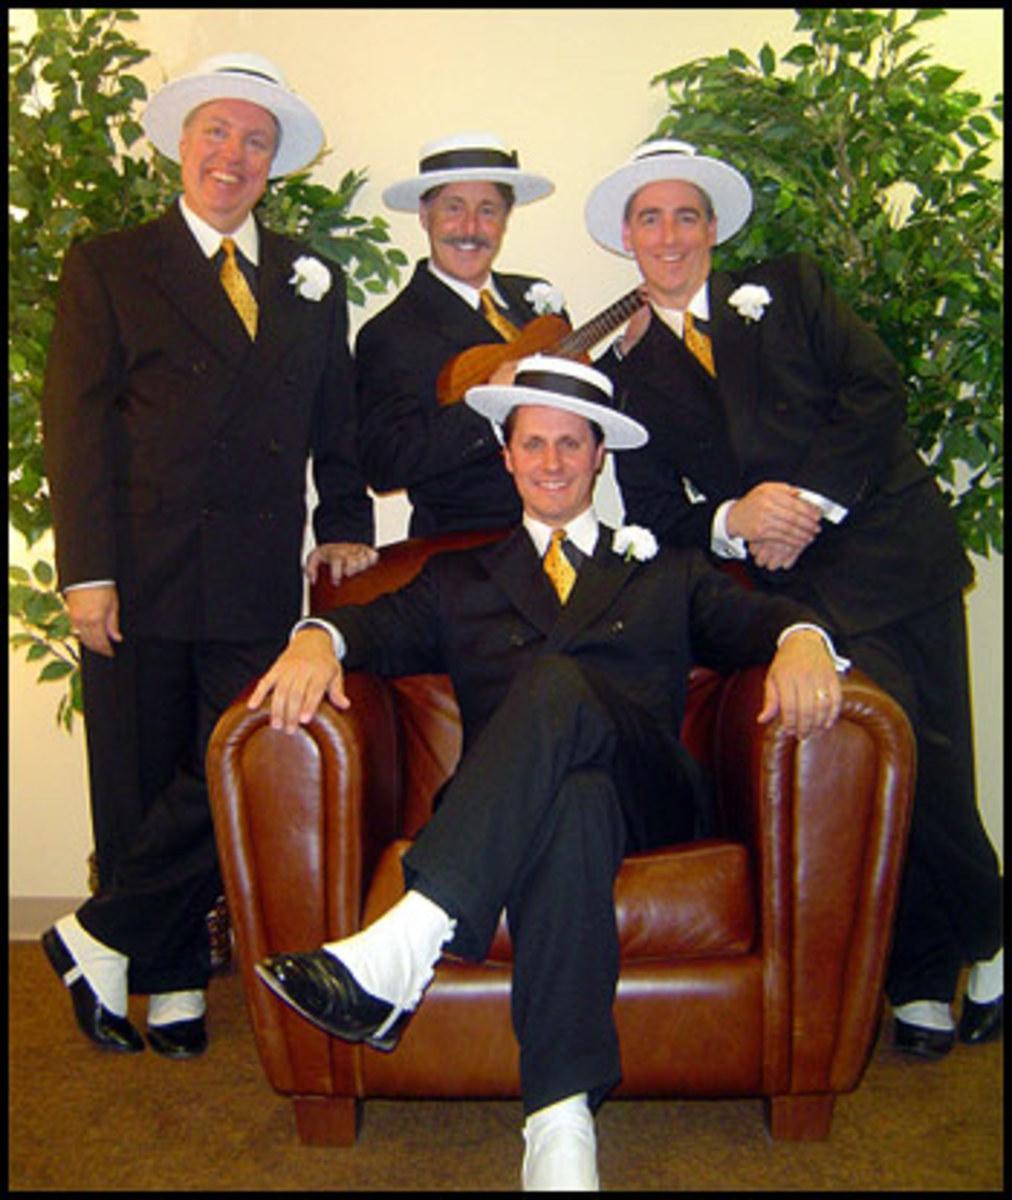 Take a gander at these gentlemen!